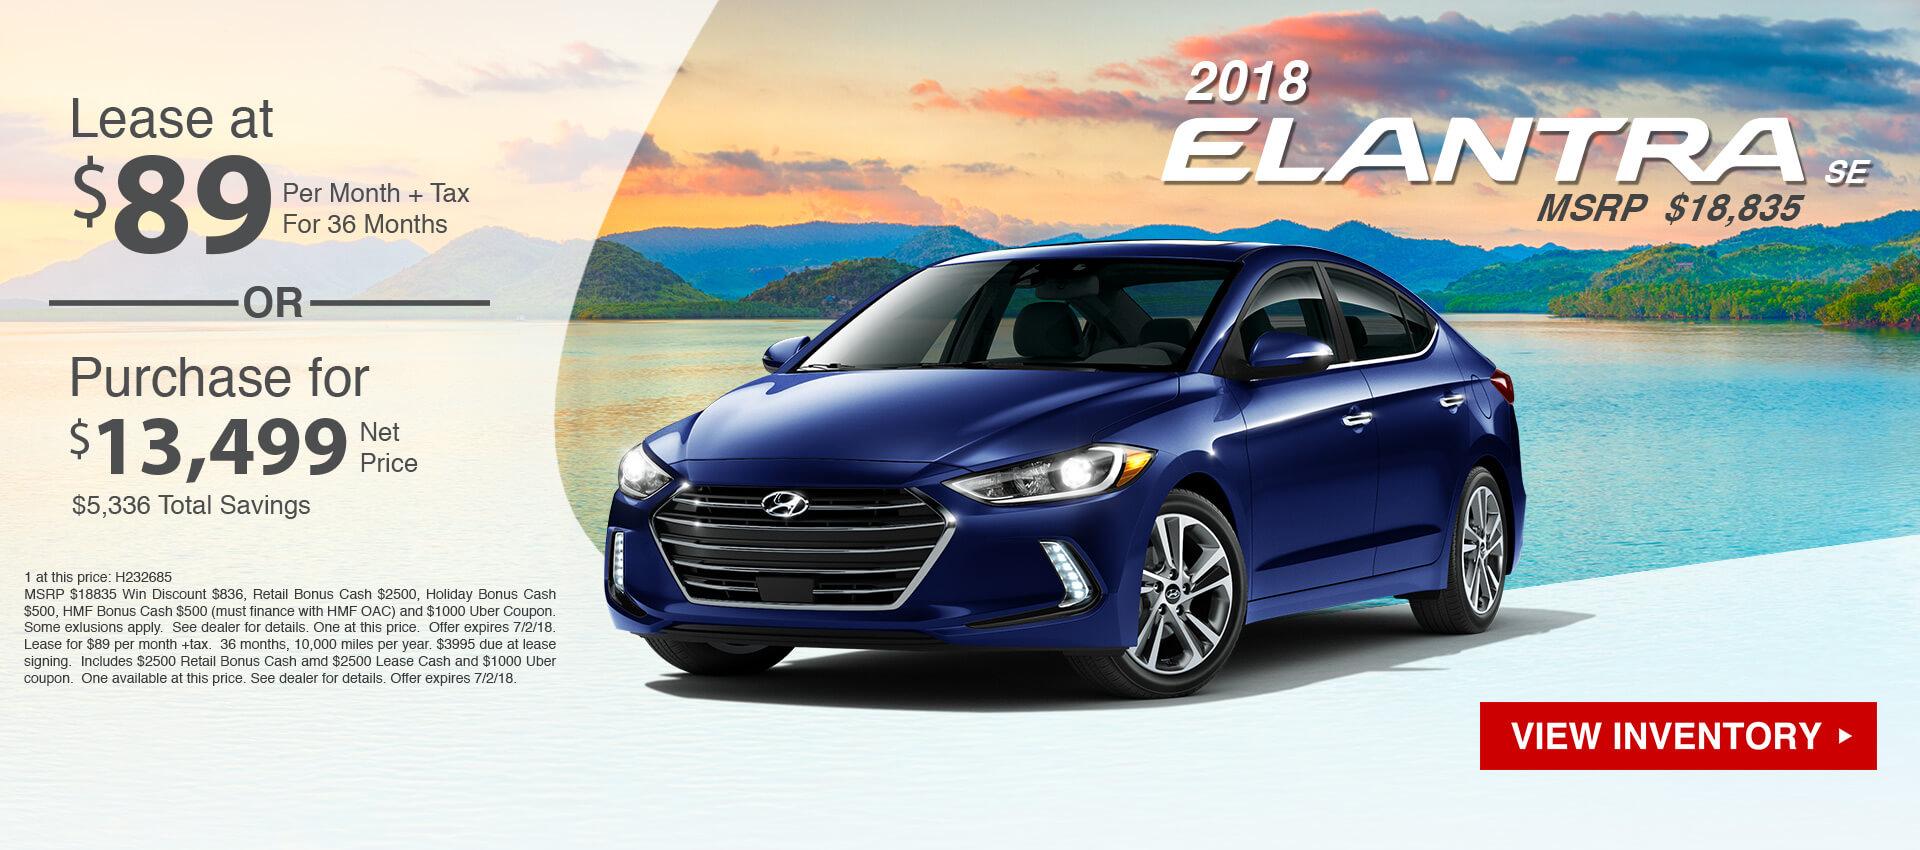 2018 Hyundai Elantra $89